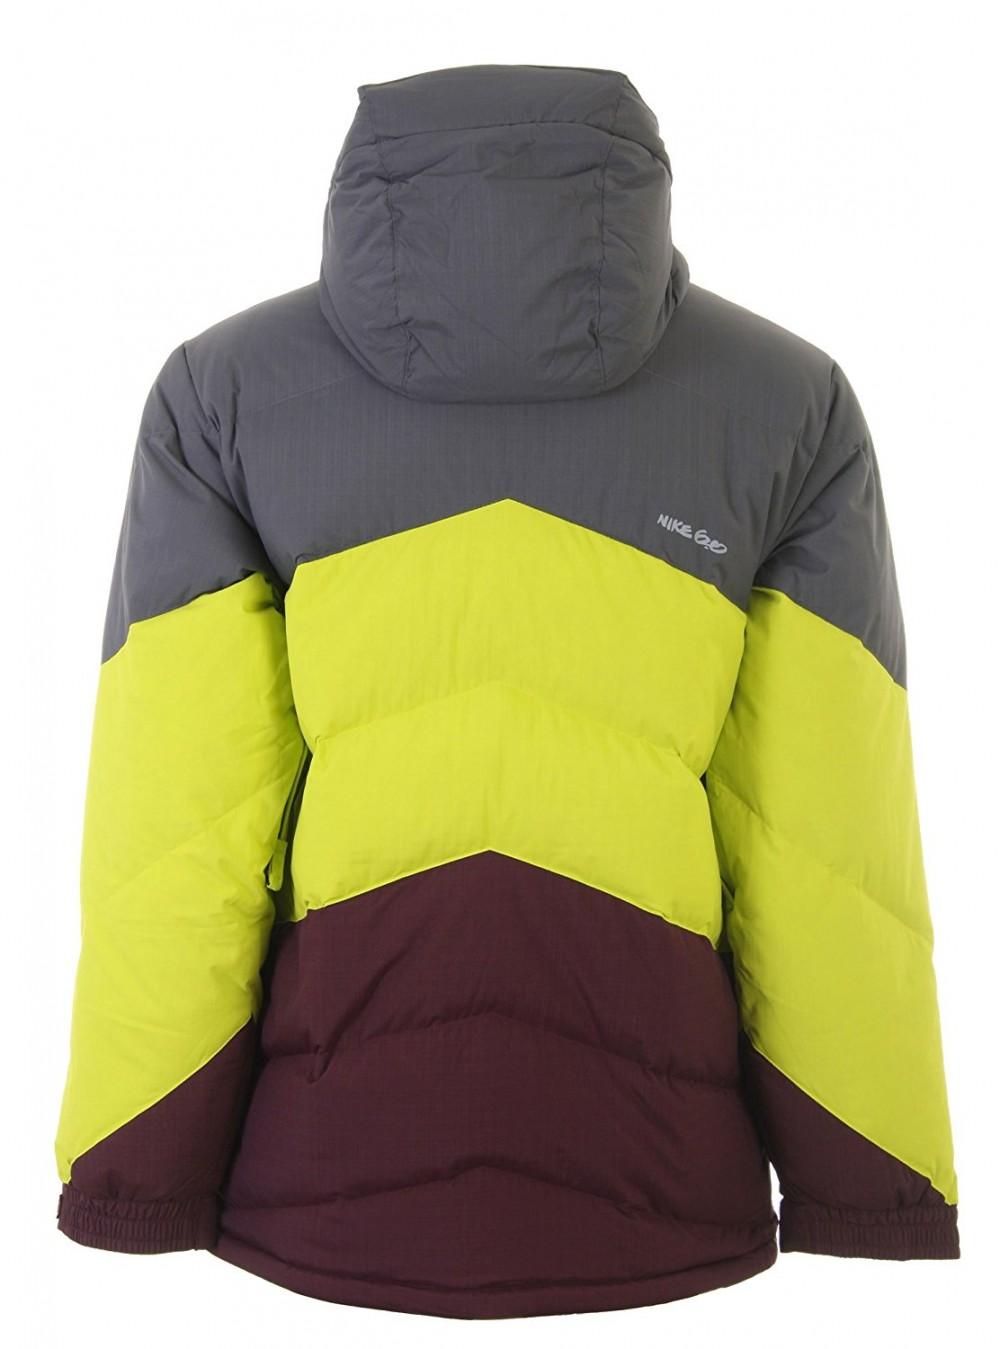 Куртка NIKE 6.0 down jacket (размер XXL/XXXL) - 1